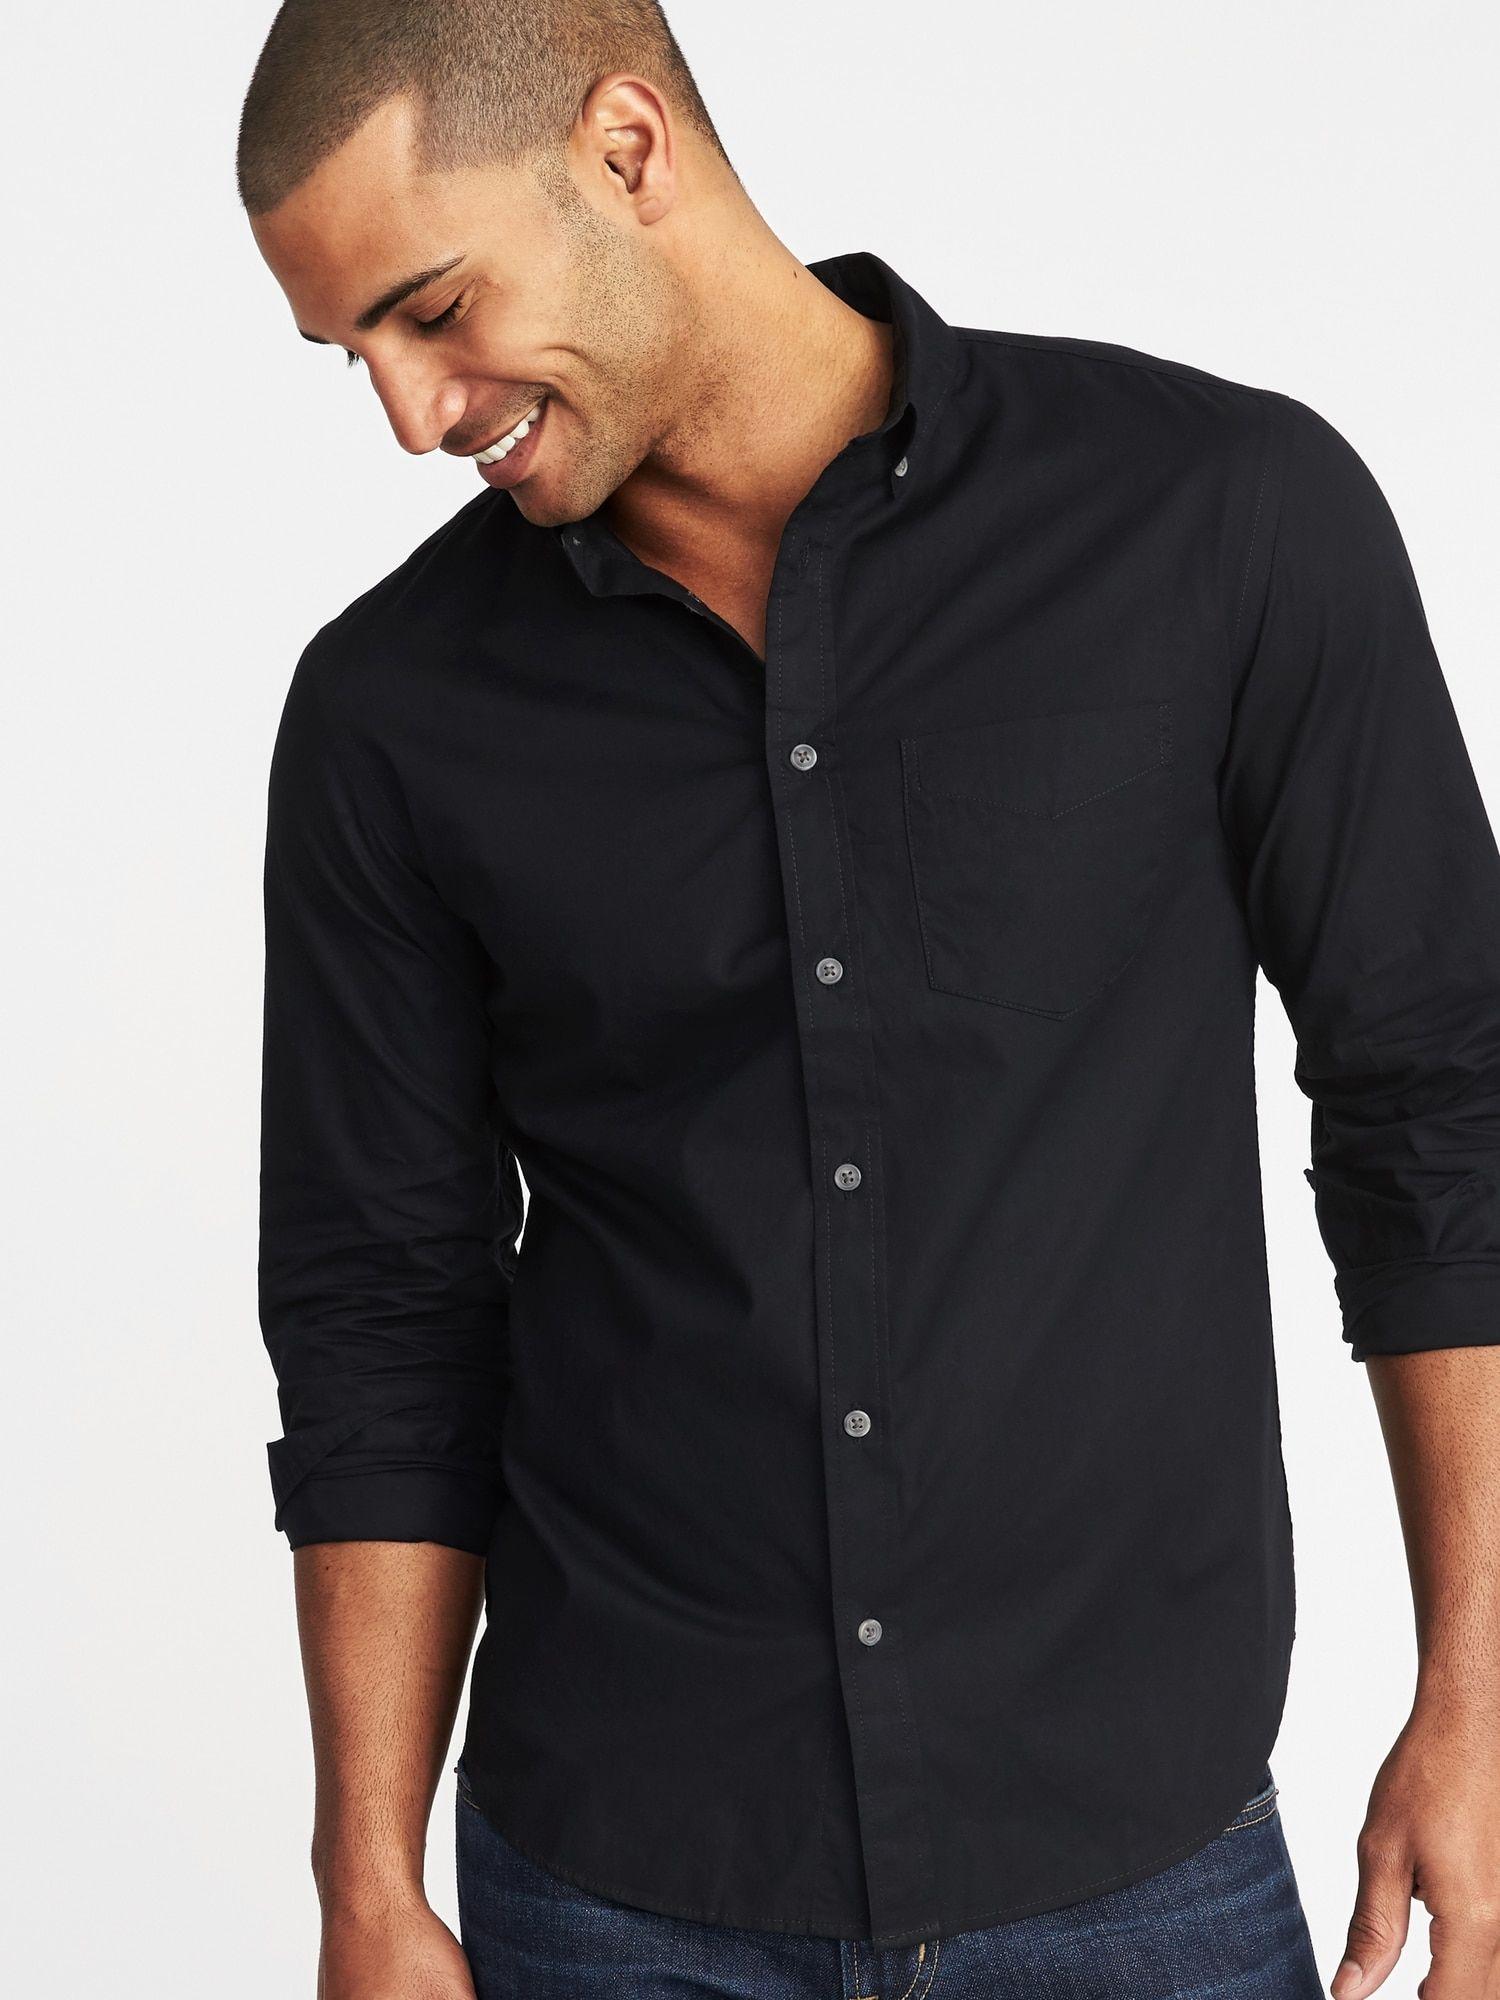 Product Black Shirt Outfit Men Black Dress Shirt Men Shirt Outfit Men [ 2000 x 1500 Pixel ]